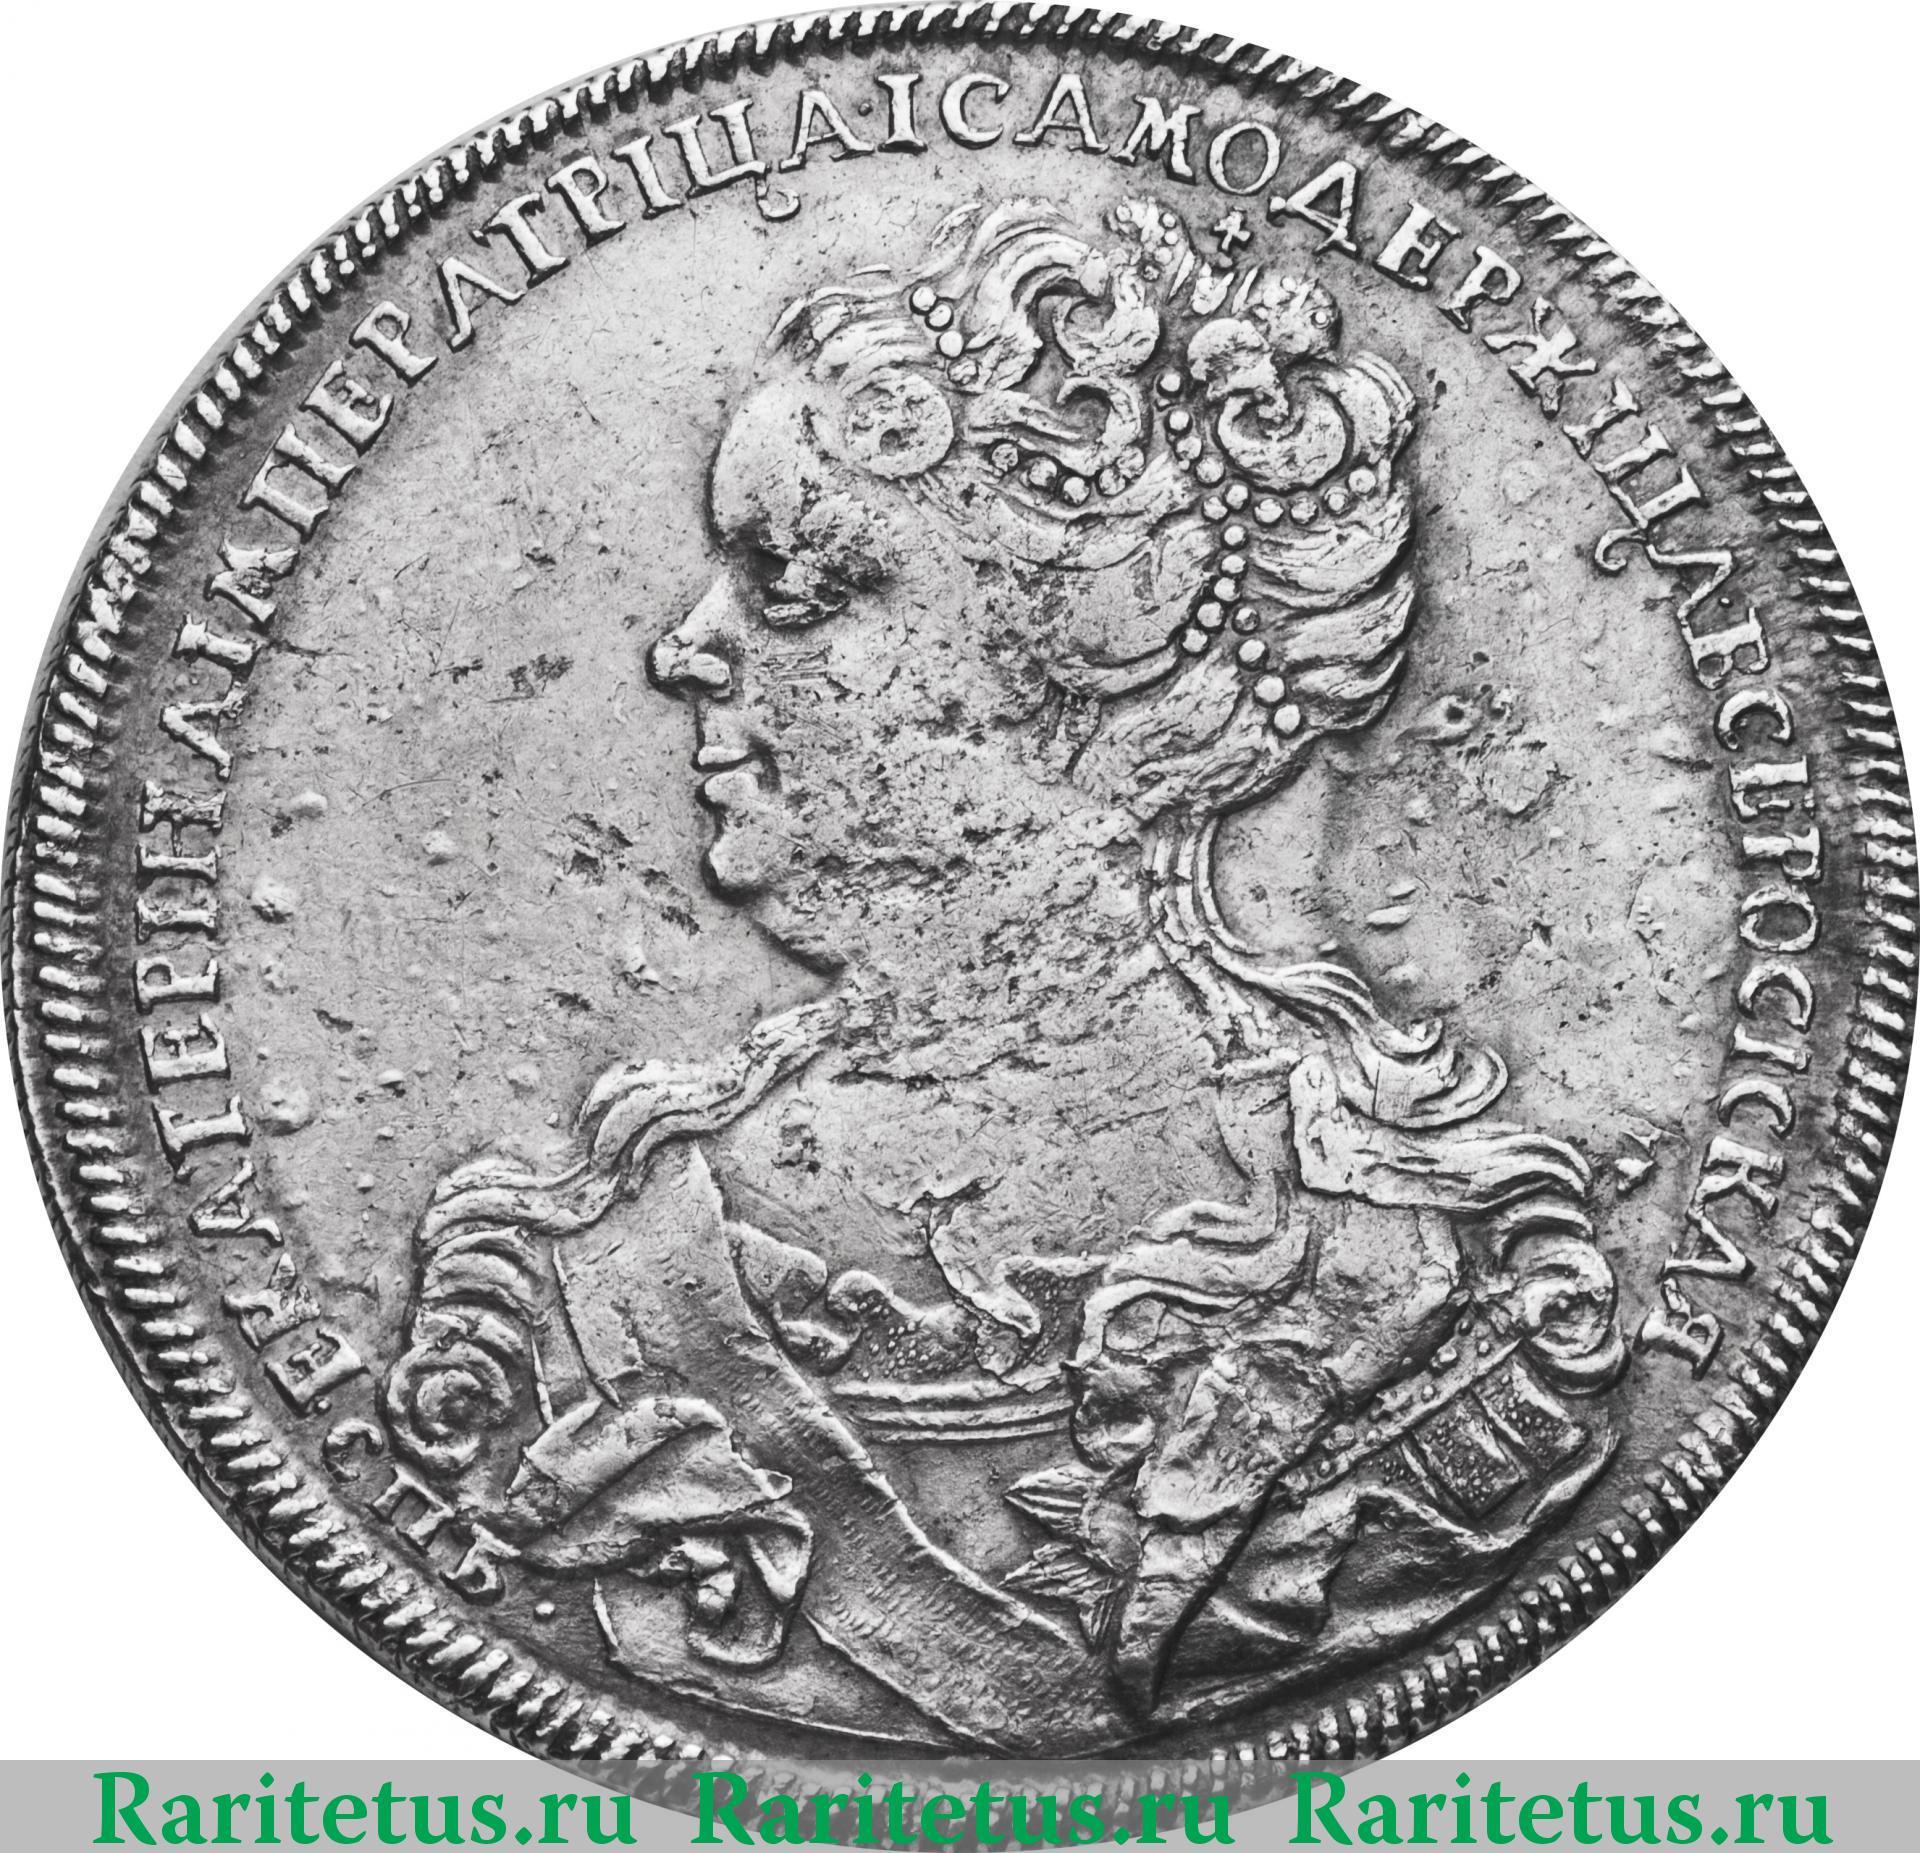 Монета 1 рубль 1725 года екатерина подделка металлоискатели б у белгород